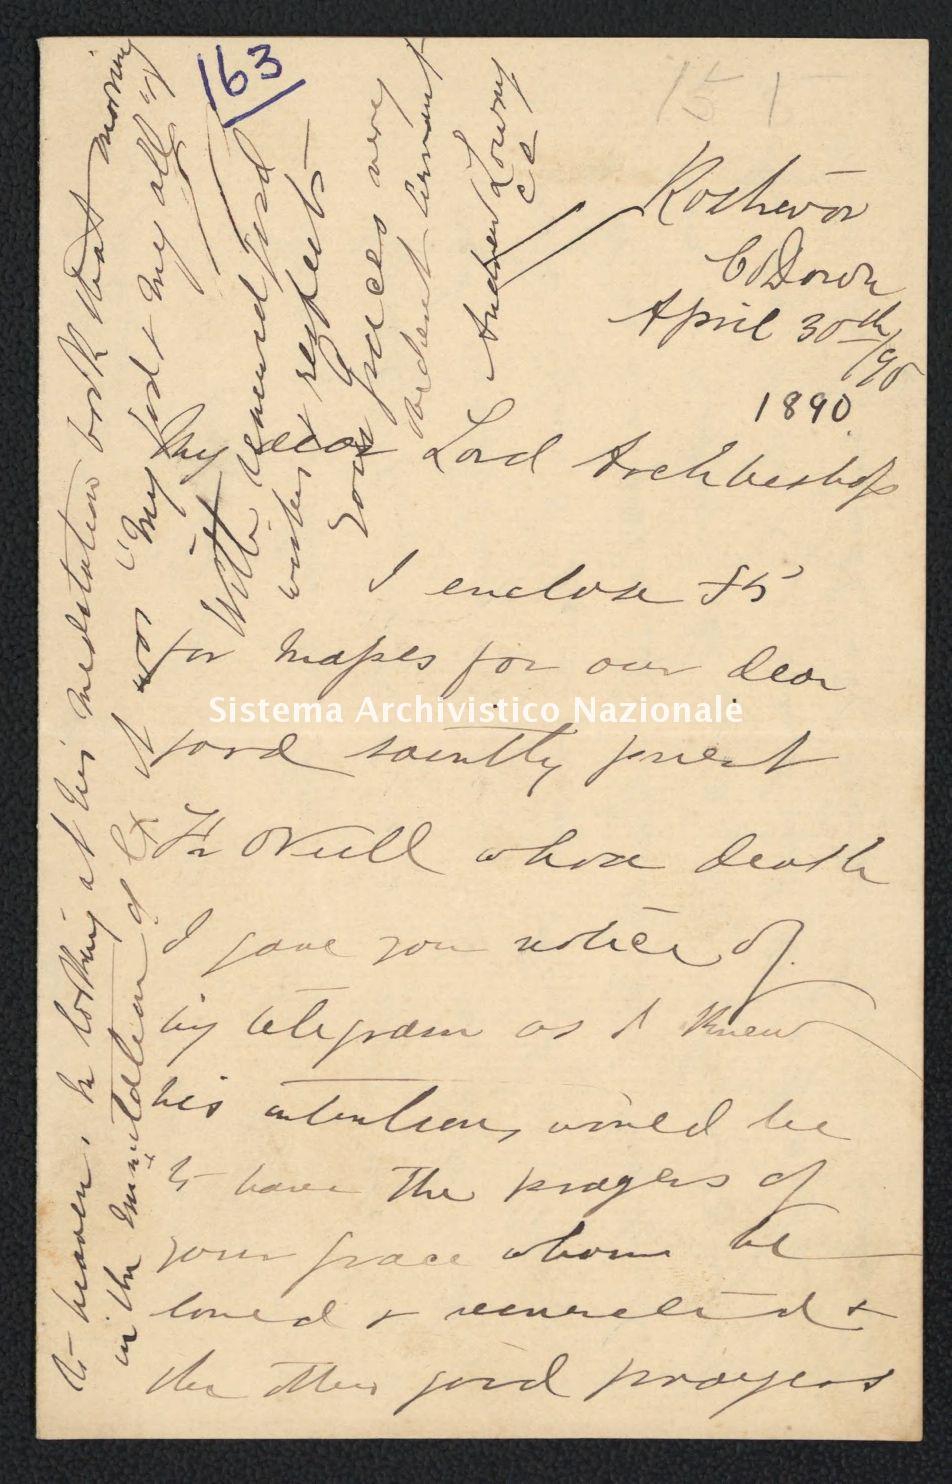 Pontificio Collegio Irlandese - Kirby_1890_163